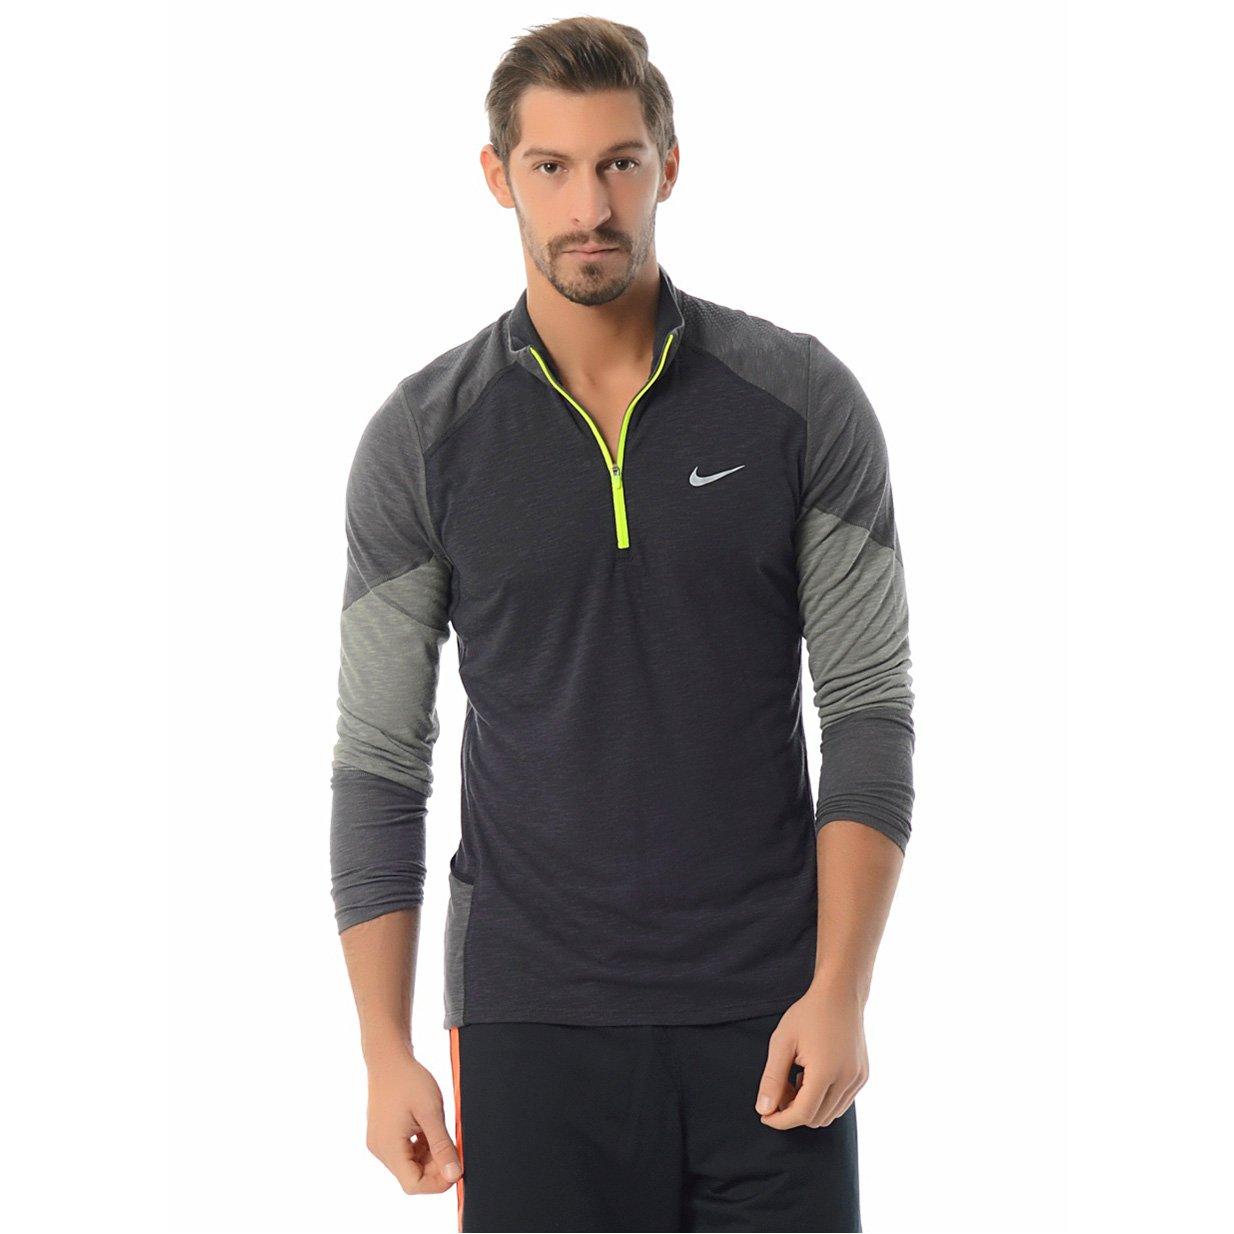 NIKE Men/'s Trail Kiger Half-Zip Running Shirt 620100-328